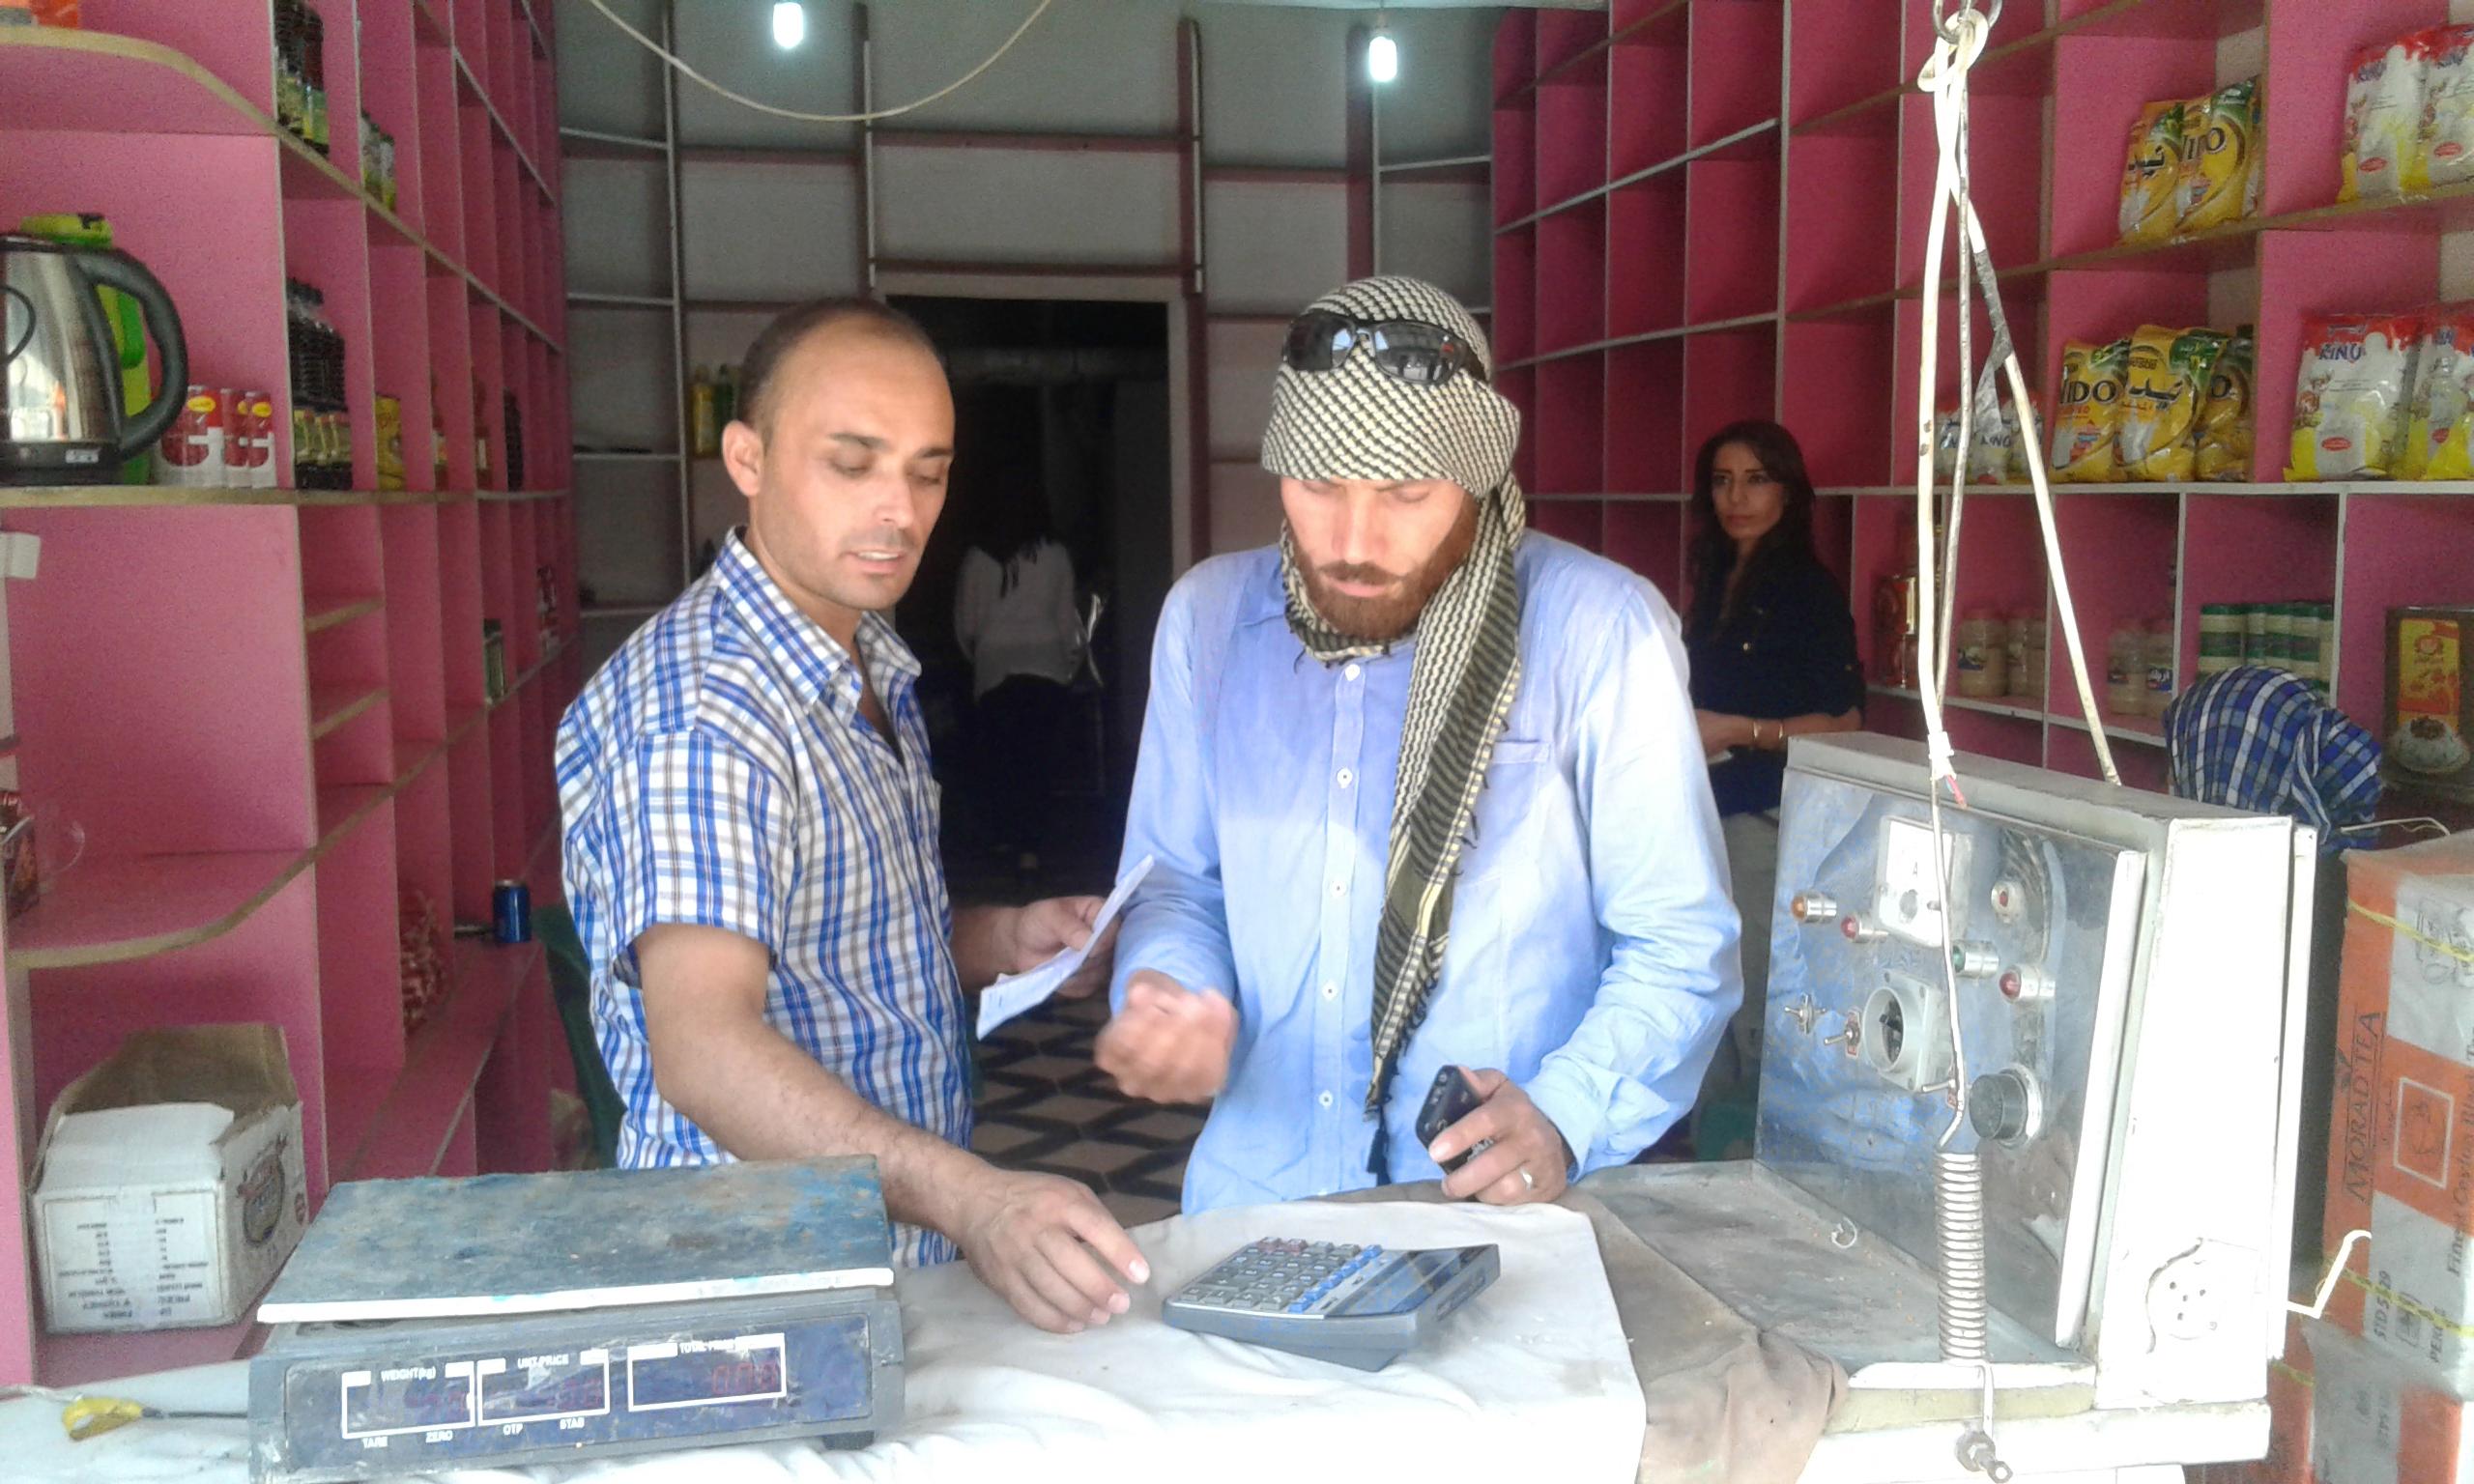 Rojava, Kurdistan, Syria, coop, cooperatives, social economy, solidarity economy, Hevgirtin, consumer cooperative